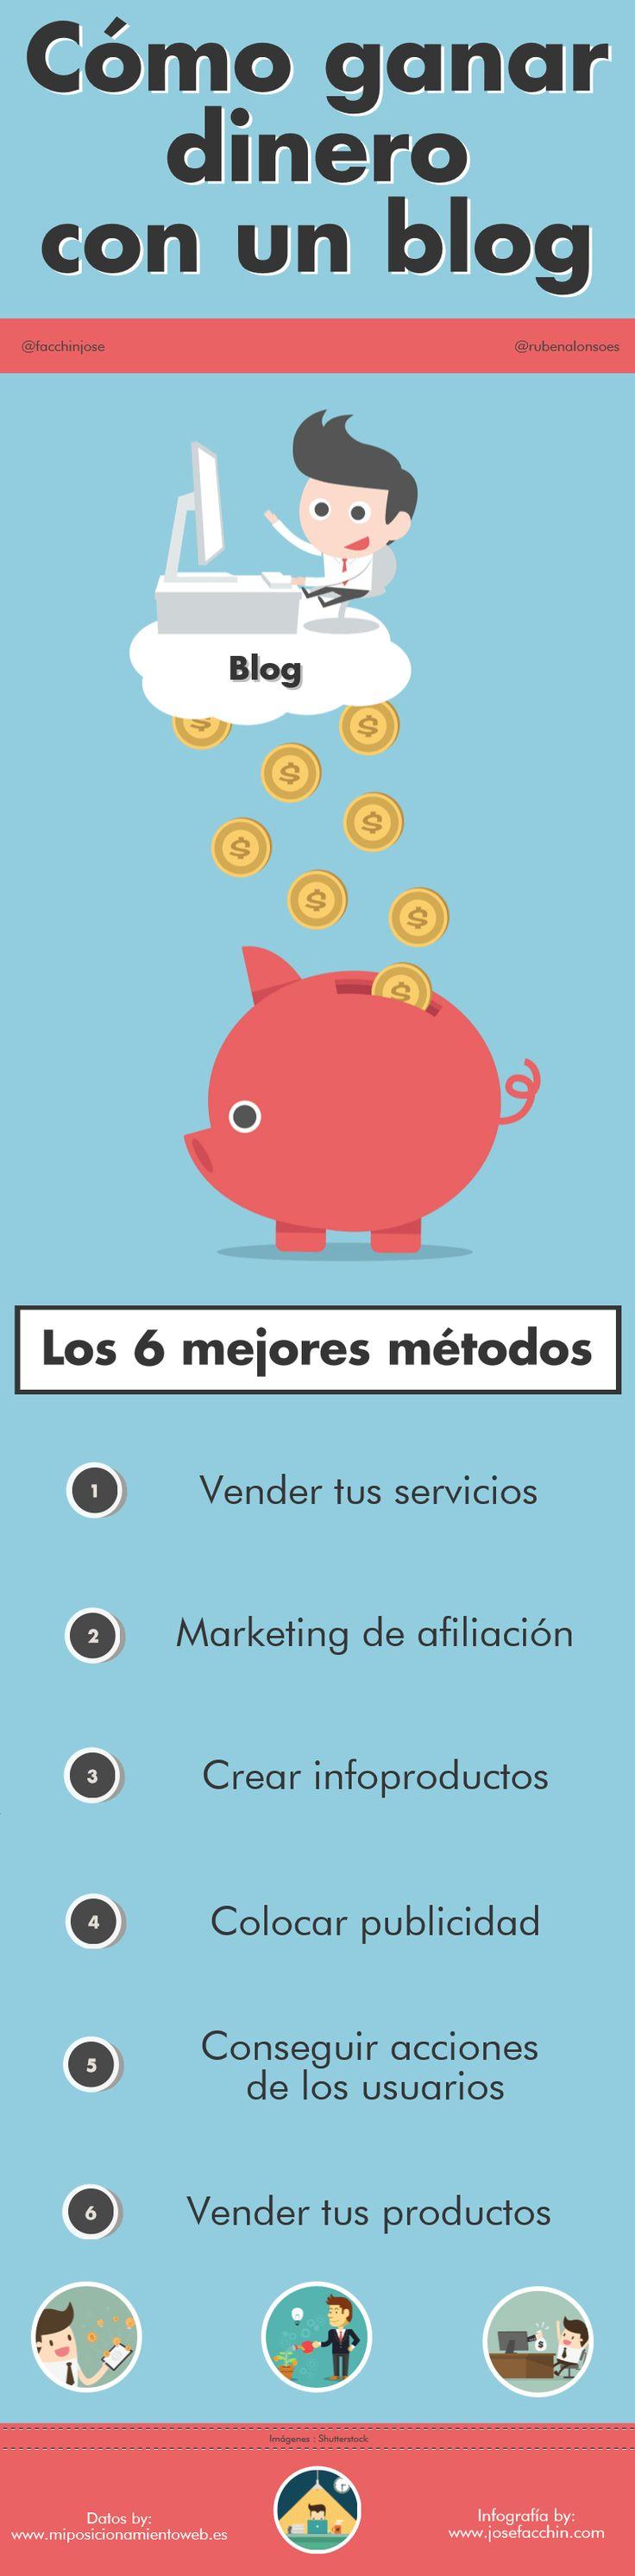 6 mejores métodos para ganar dinero con tu Blog #infografia #infographic #socialmedia